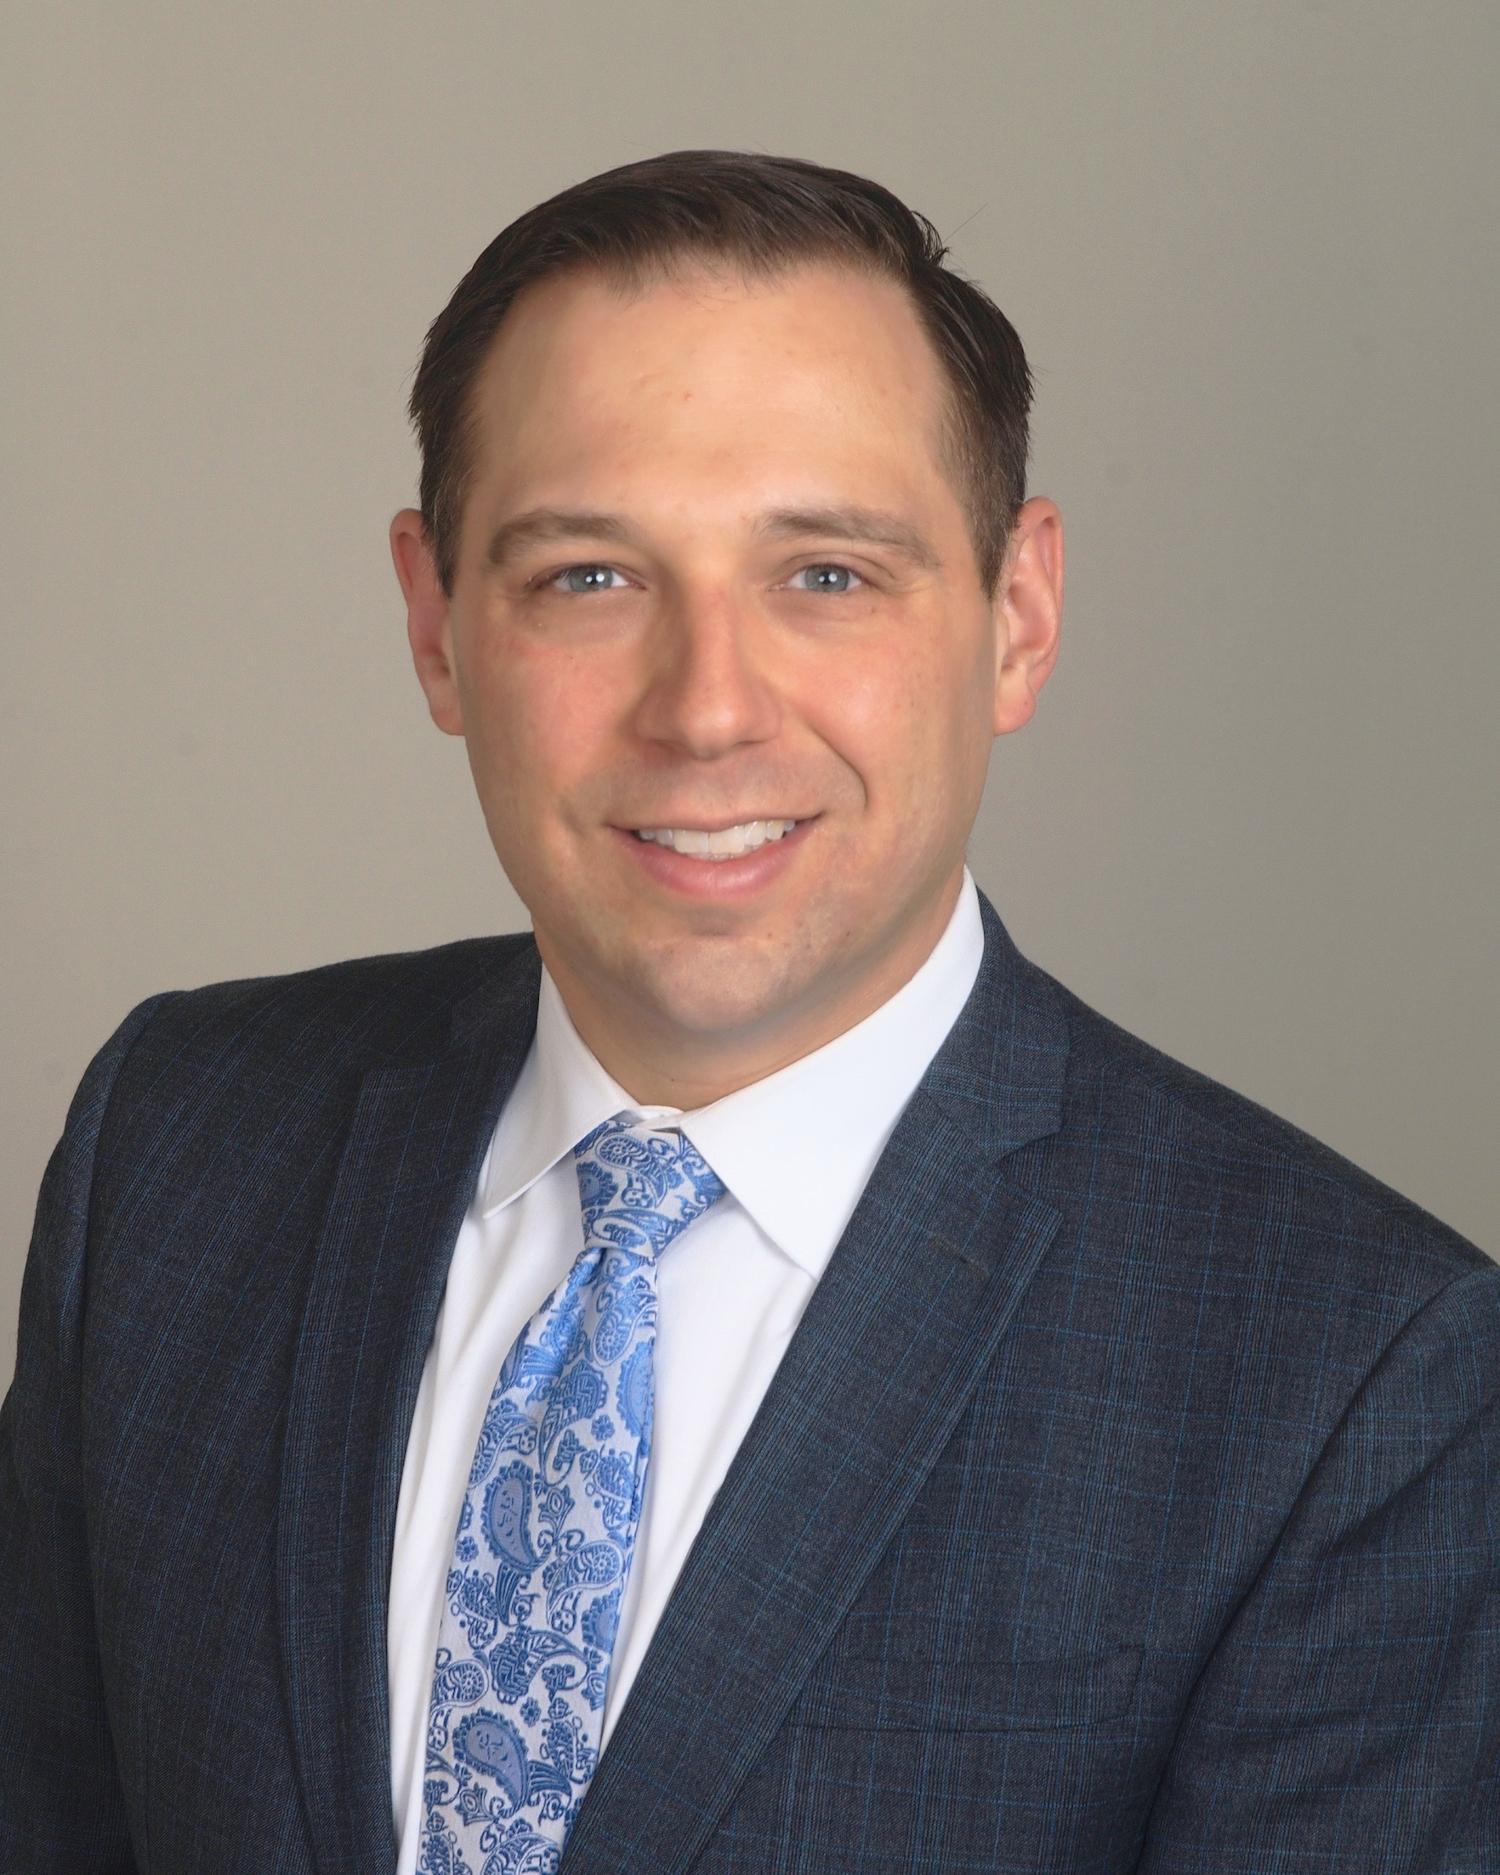 JAMES EISEMAN Your Financial Advisor